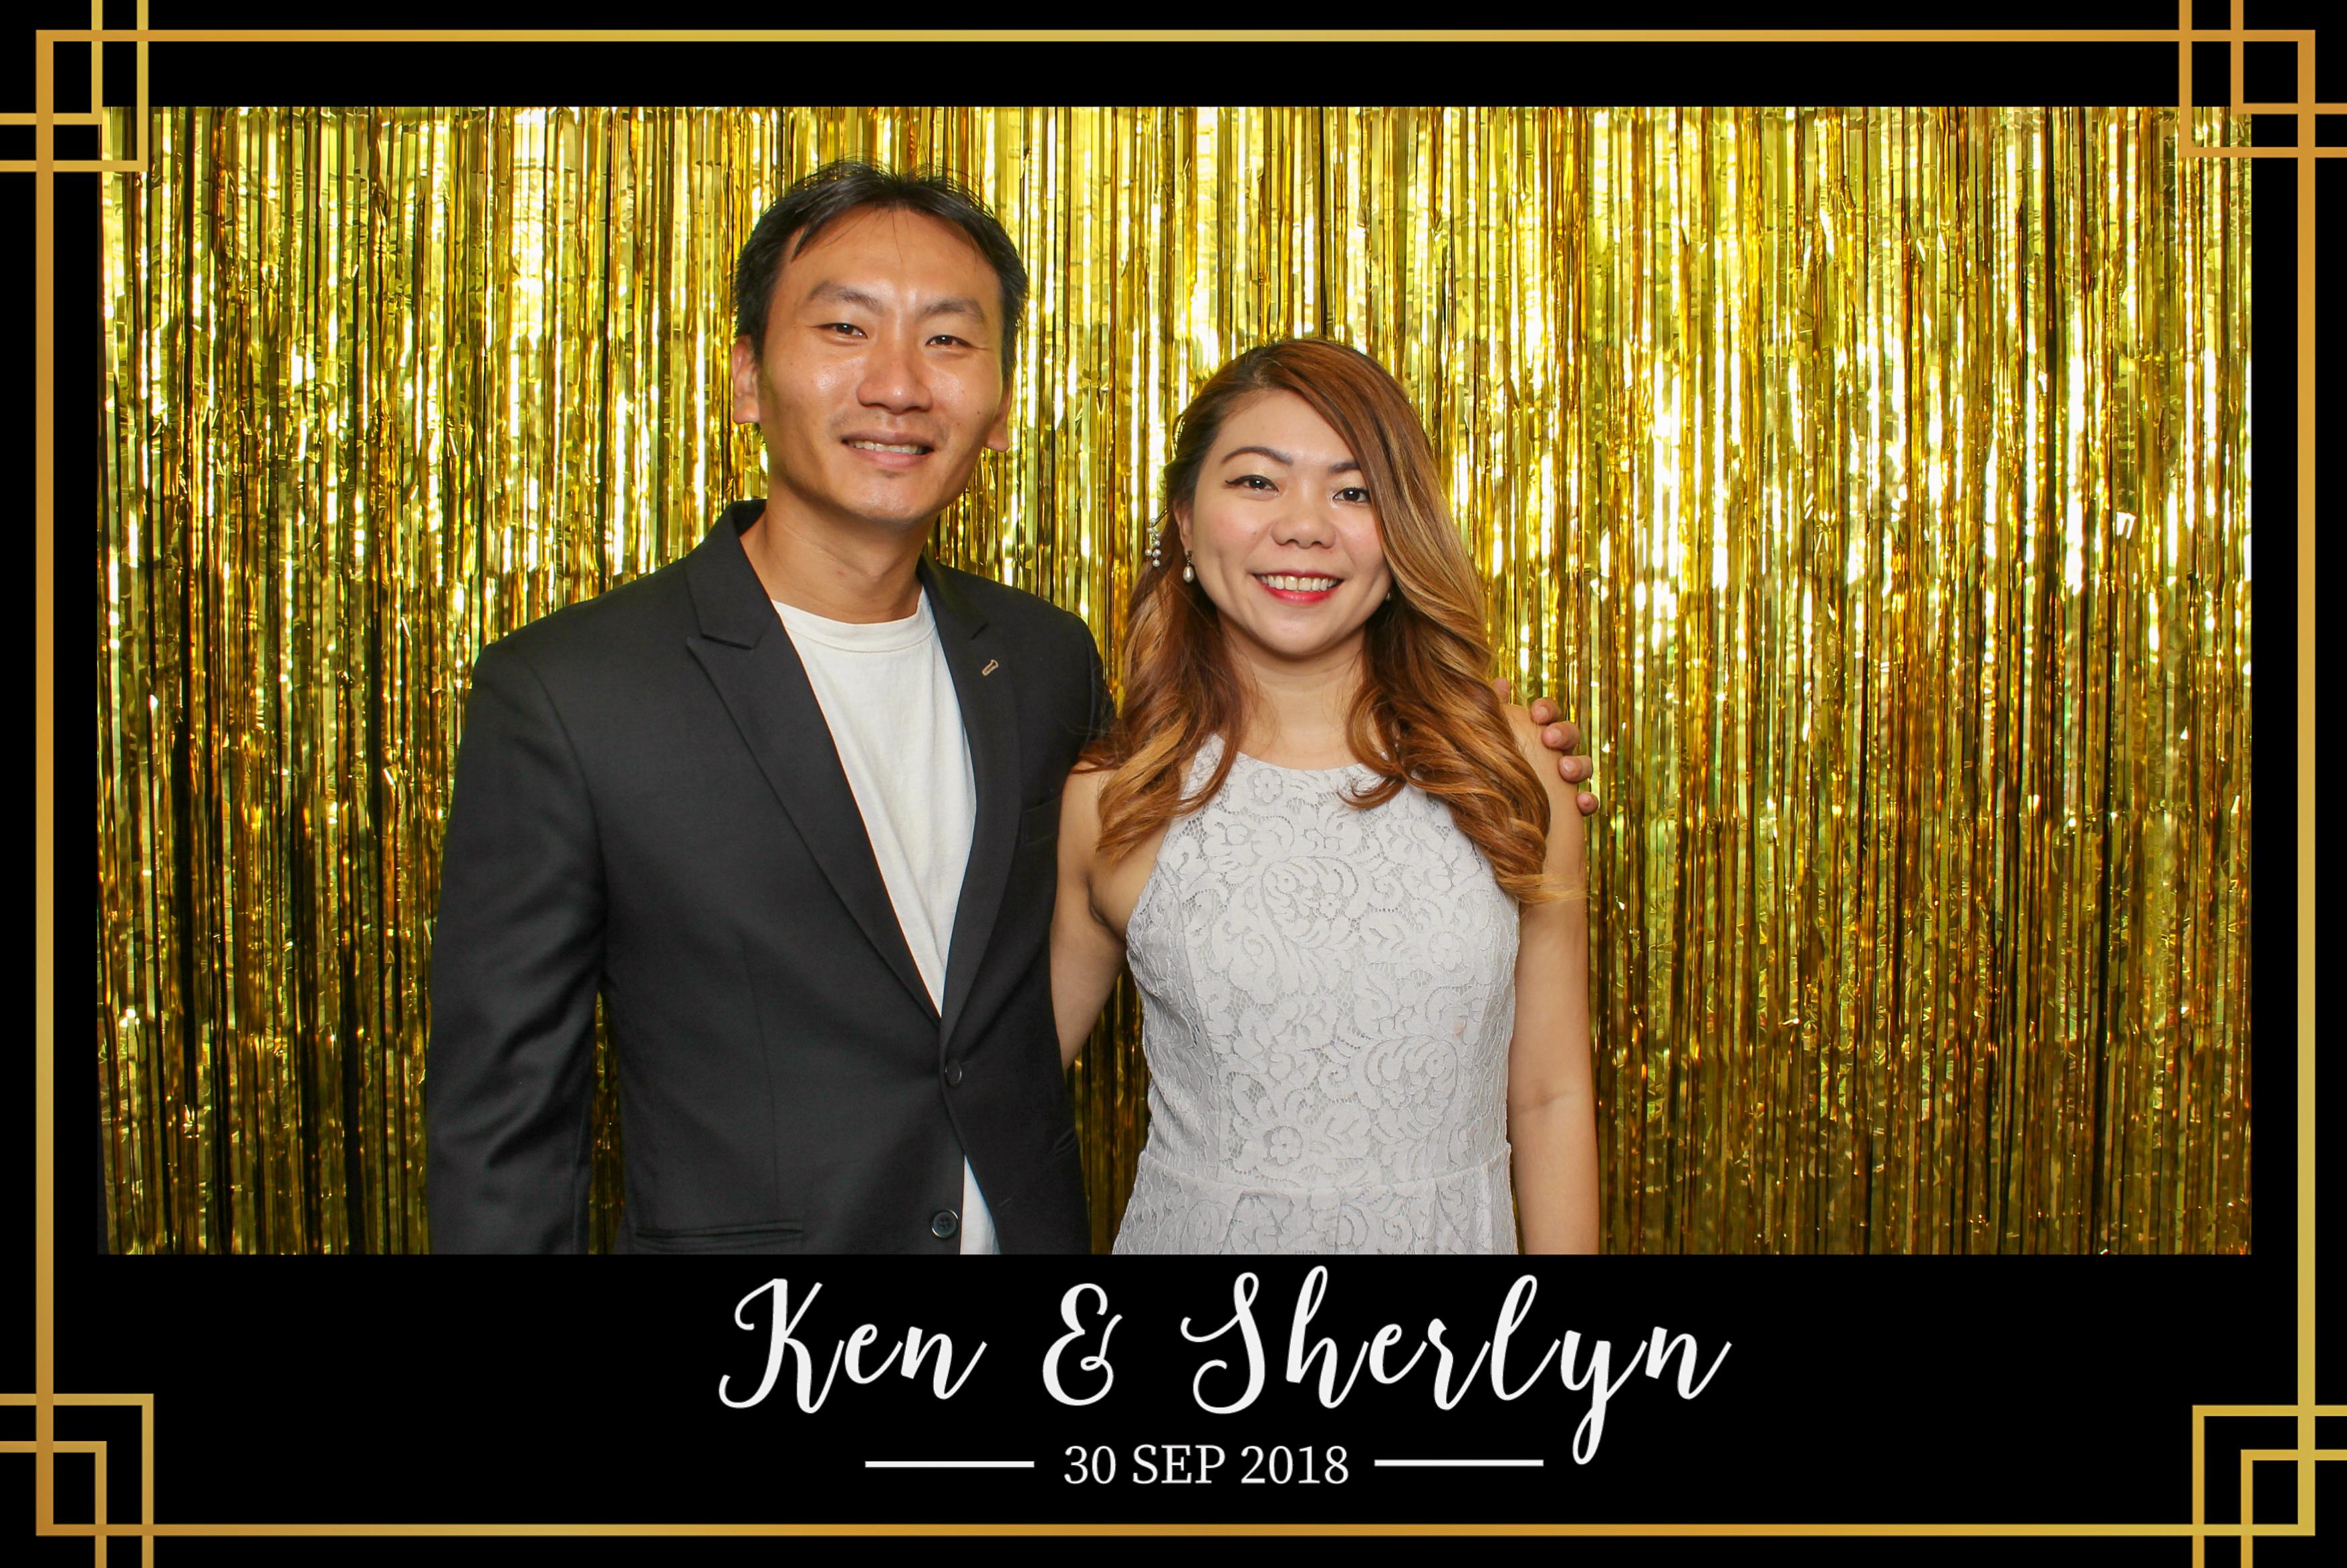 Ken Sherlyn wedding photo booth (41)